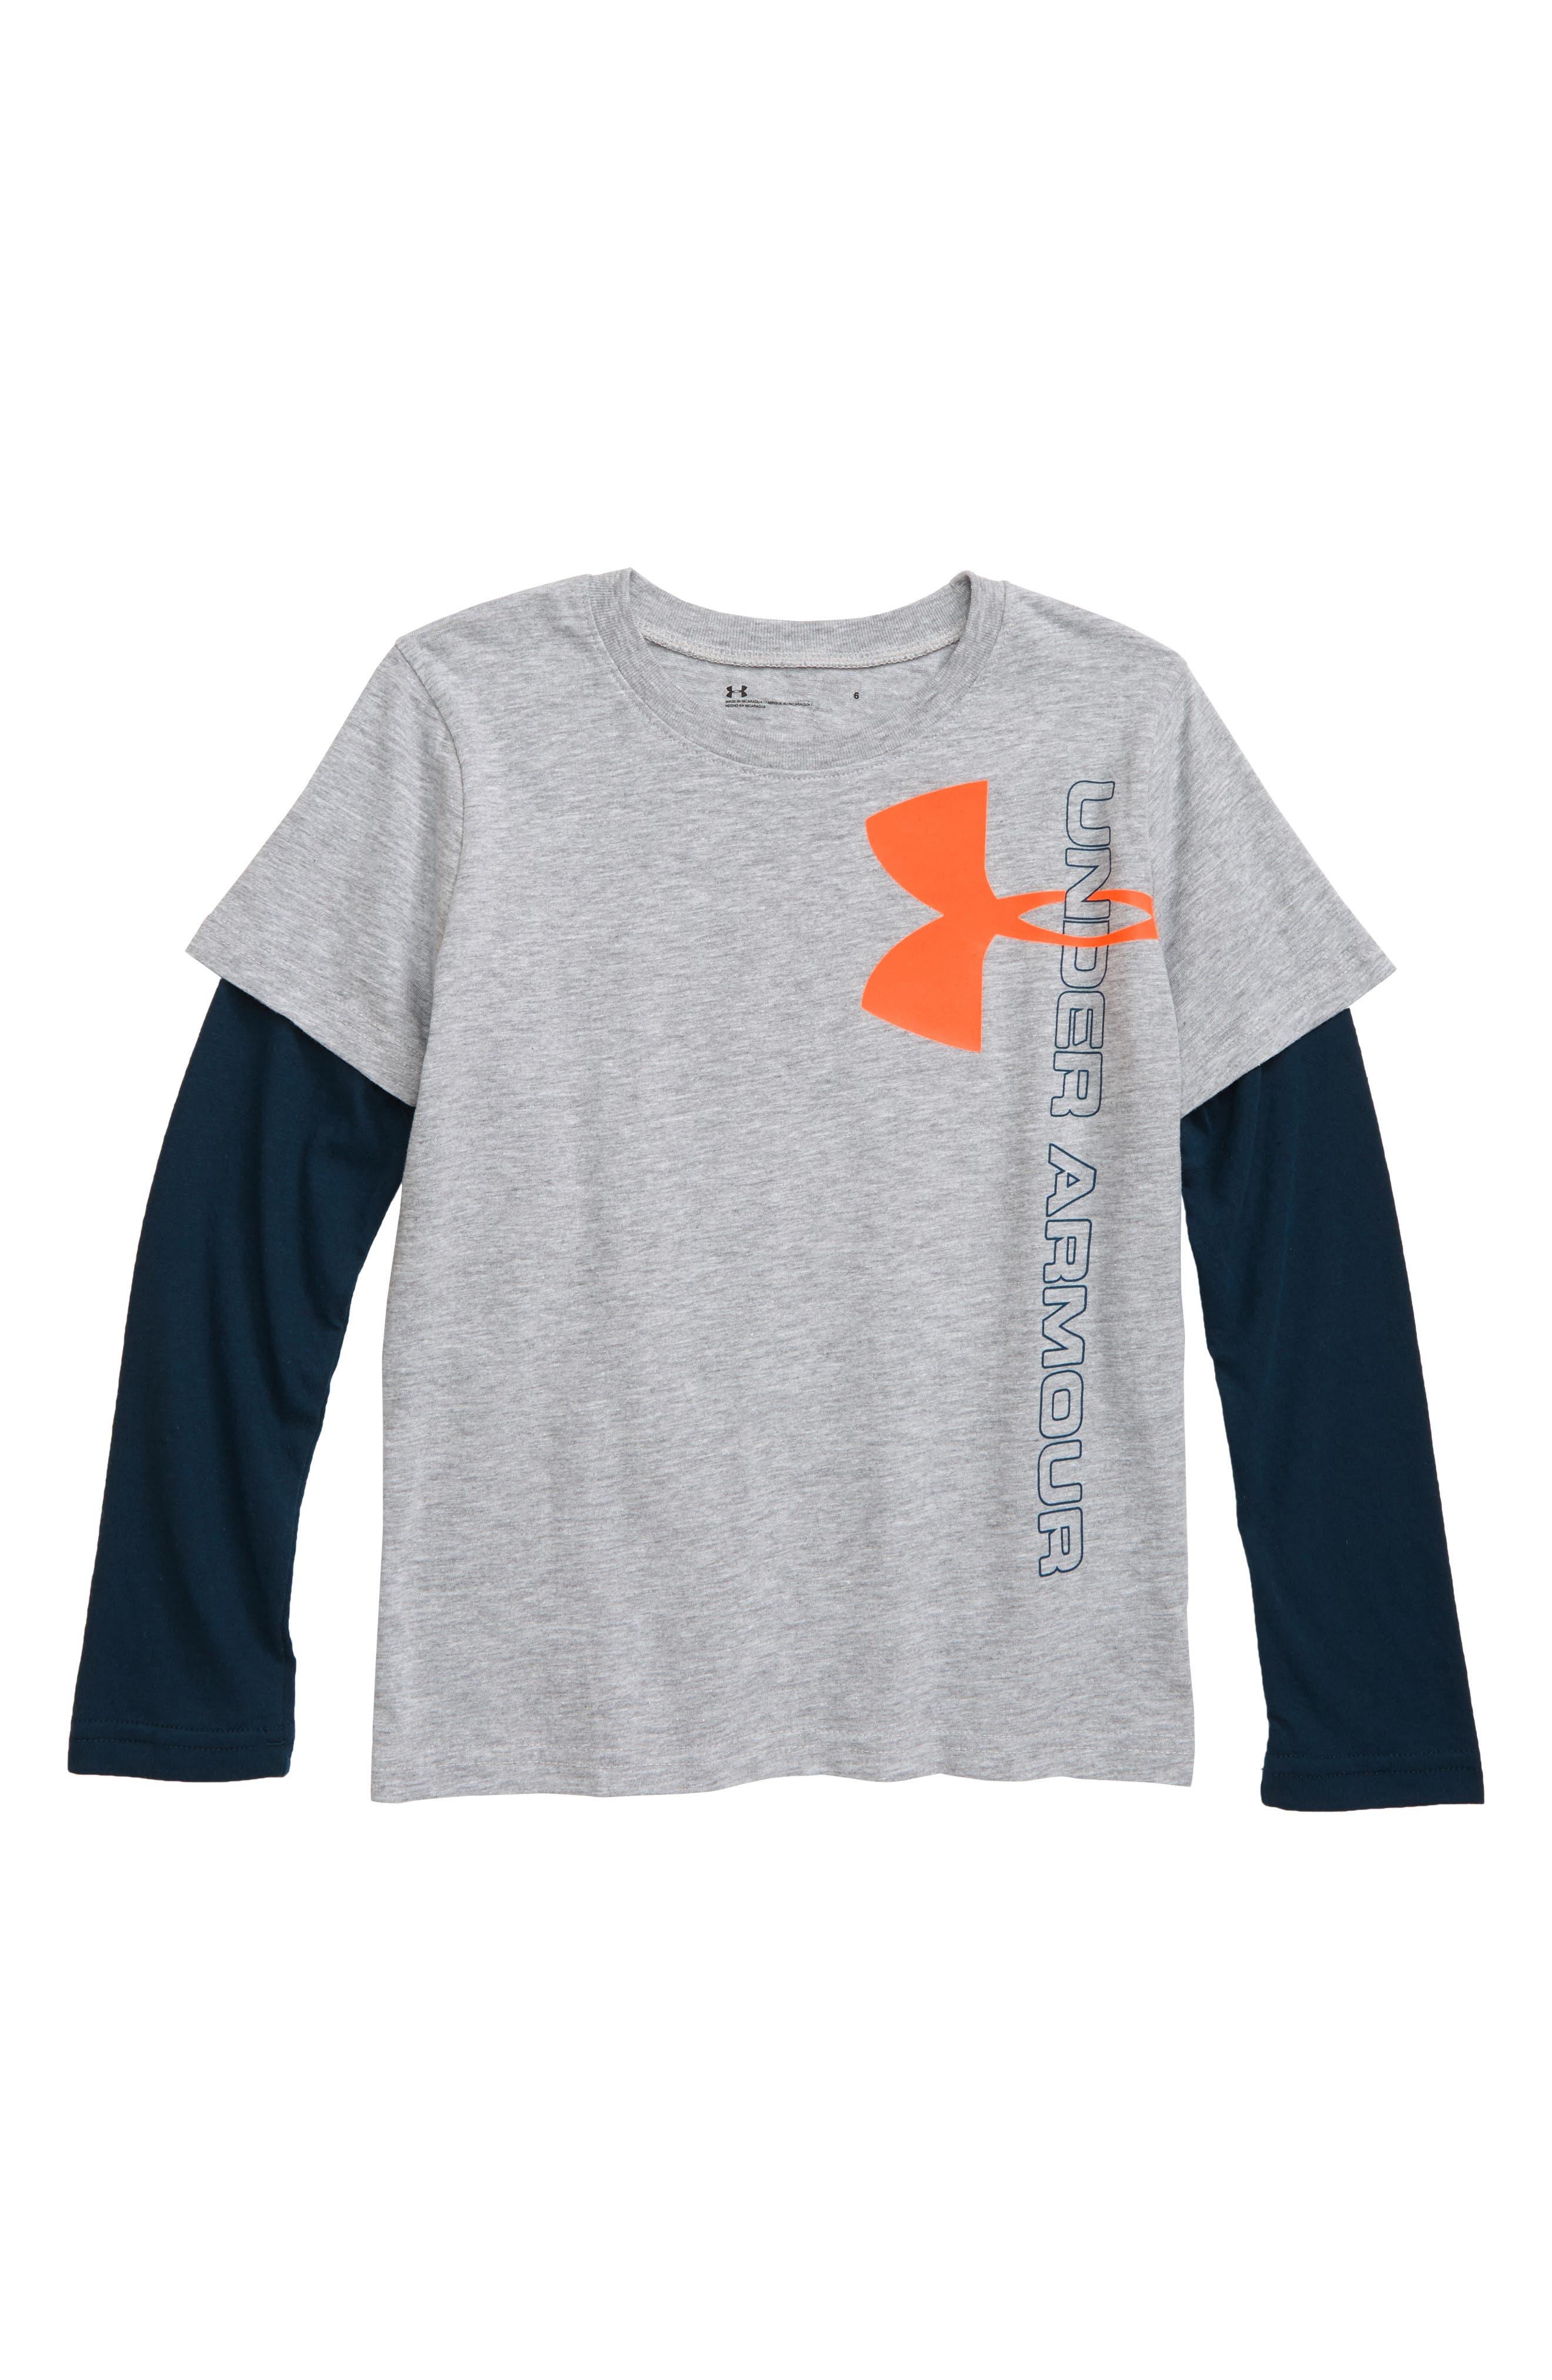 ba56a5e01e983 Kids' Under Armour Apparel: T-Shirts, Jeans, Pants & Hoodies | Nordstrom